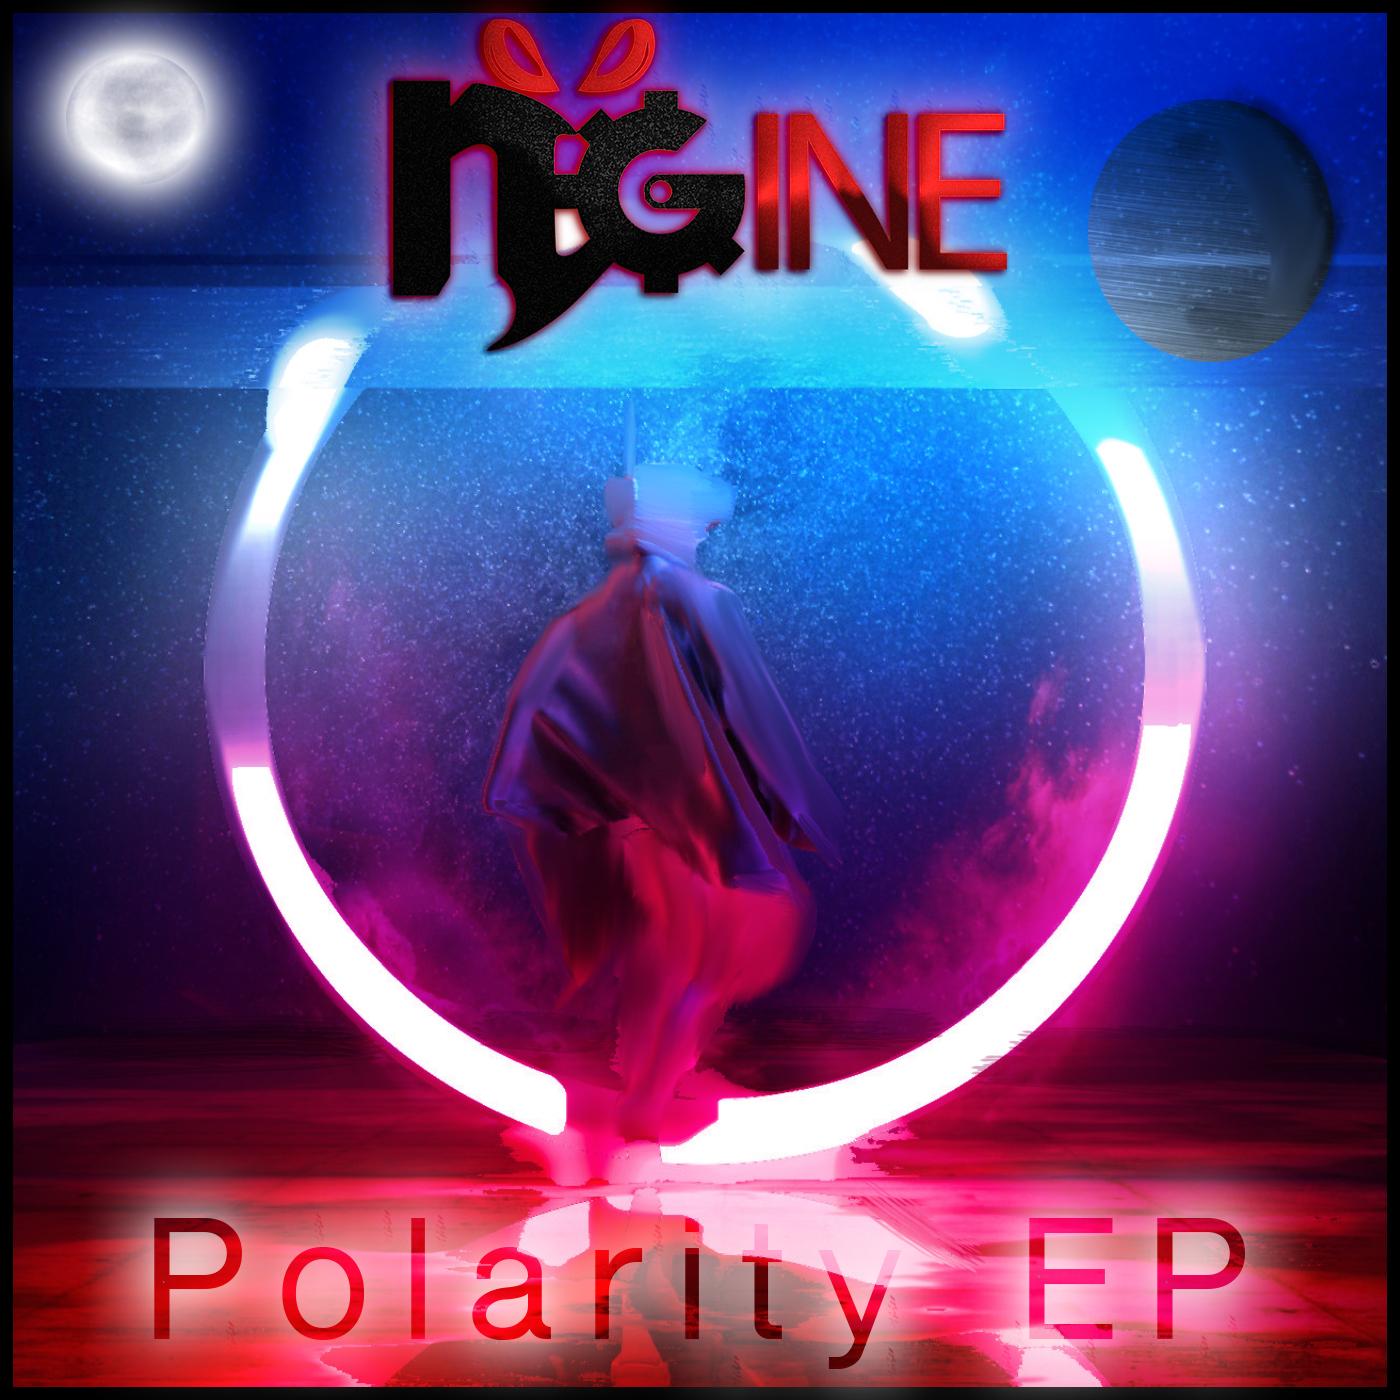 Polarity CD Blank.jpg